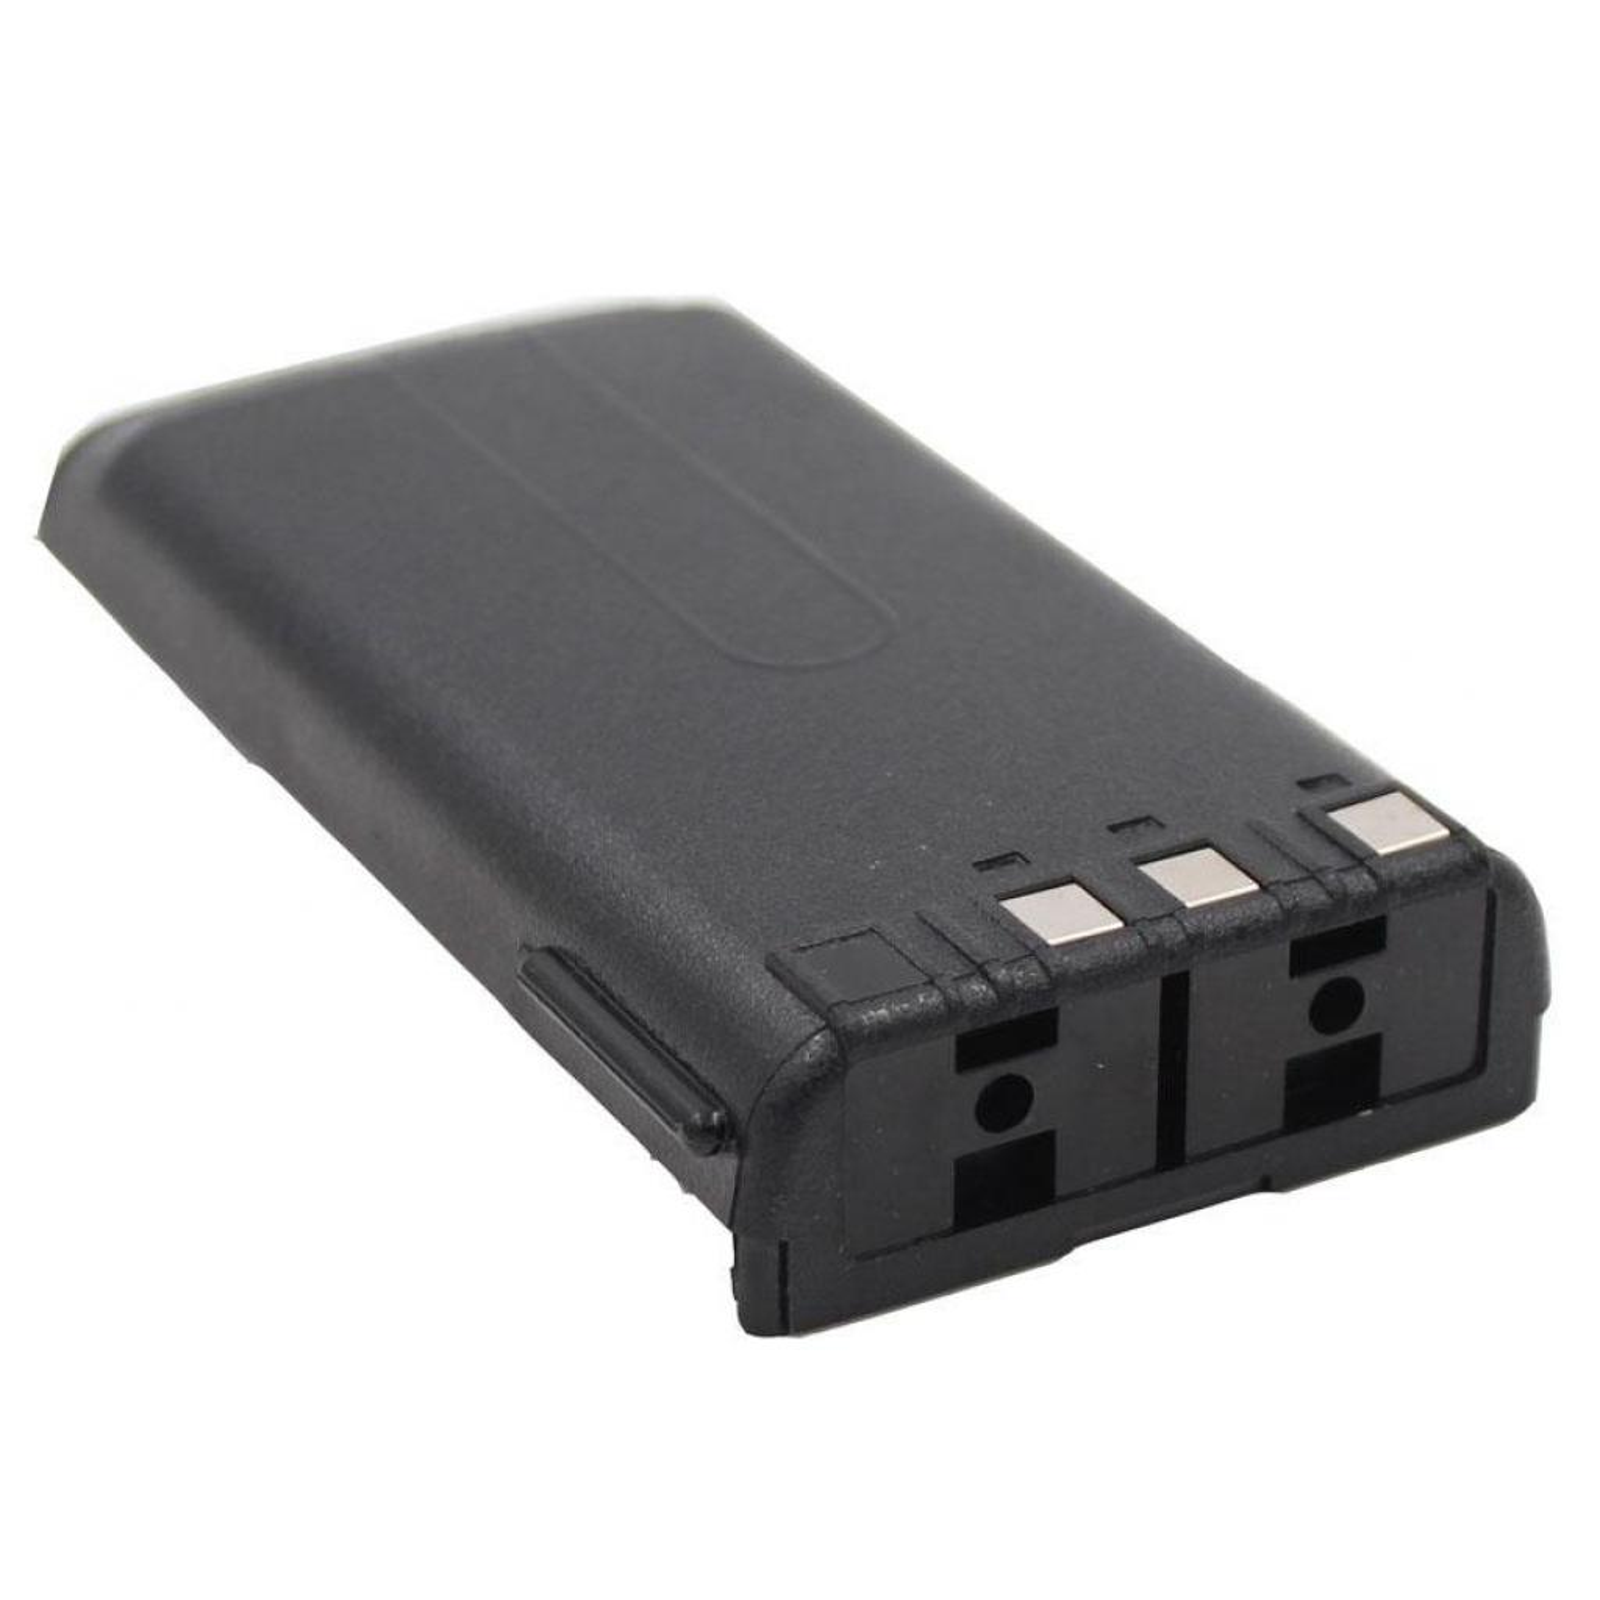 Аккумуляторная батарея для телефона Agent эквивалент акумулятора KNB-15 для Kenwood 1100mAh NiCd (PTK-15) изображение 3